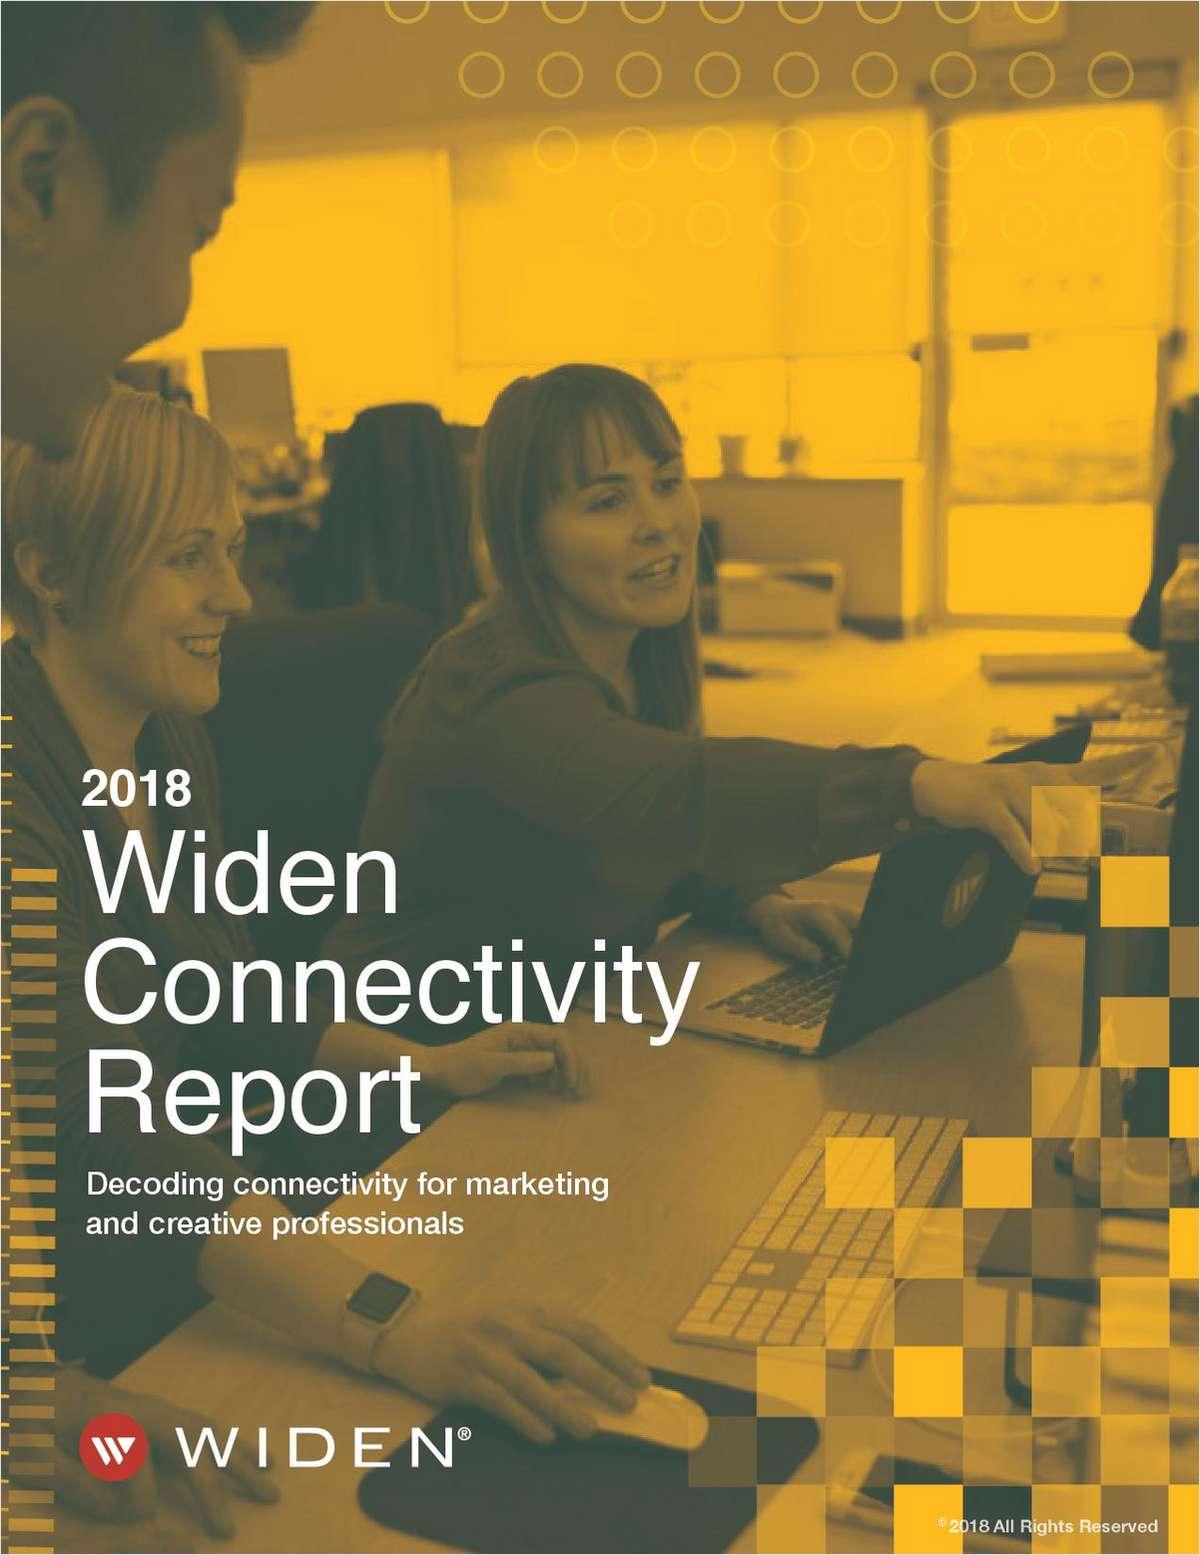 Widen Connectivity Report